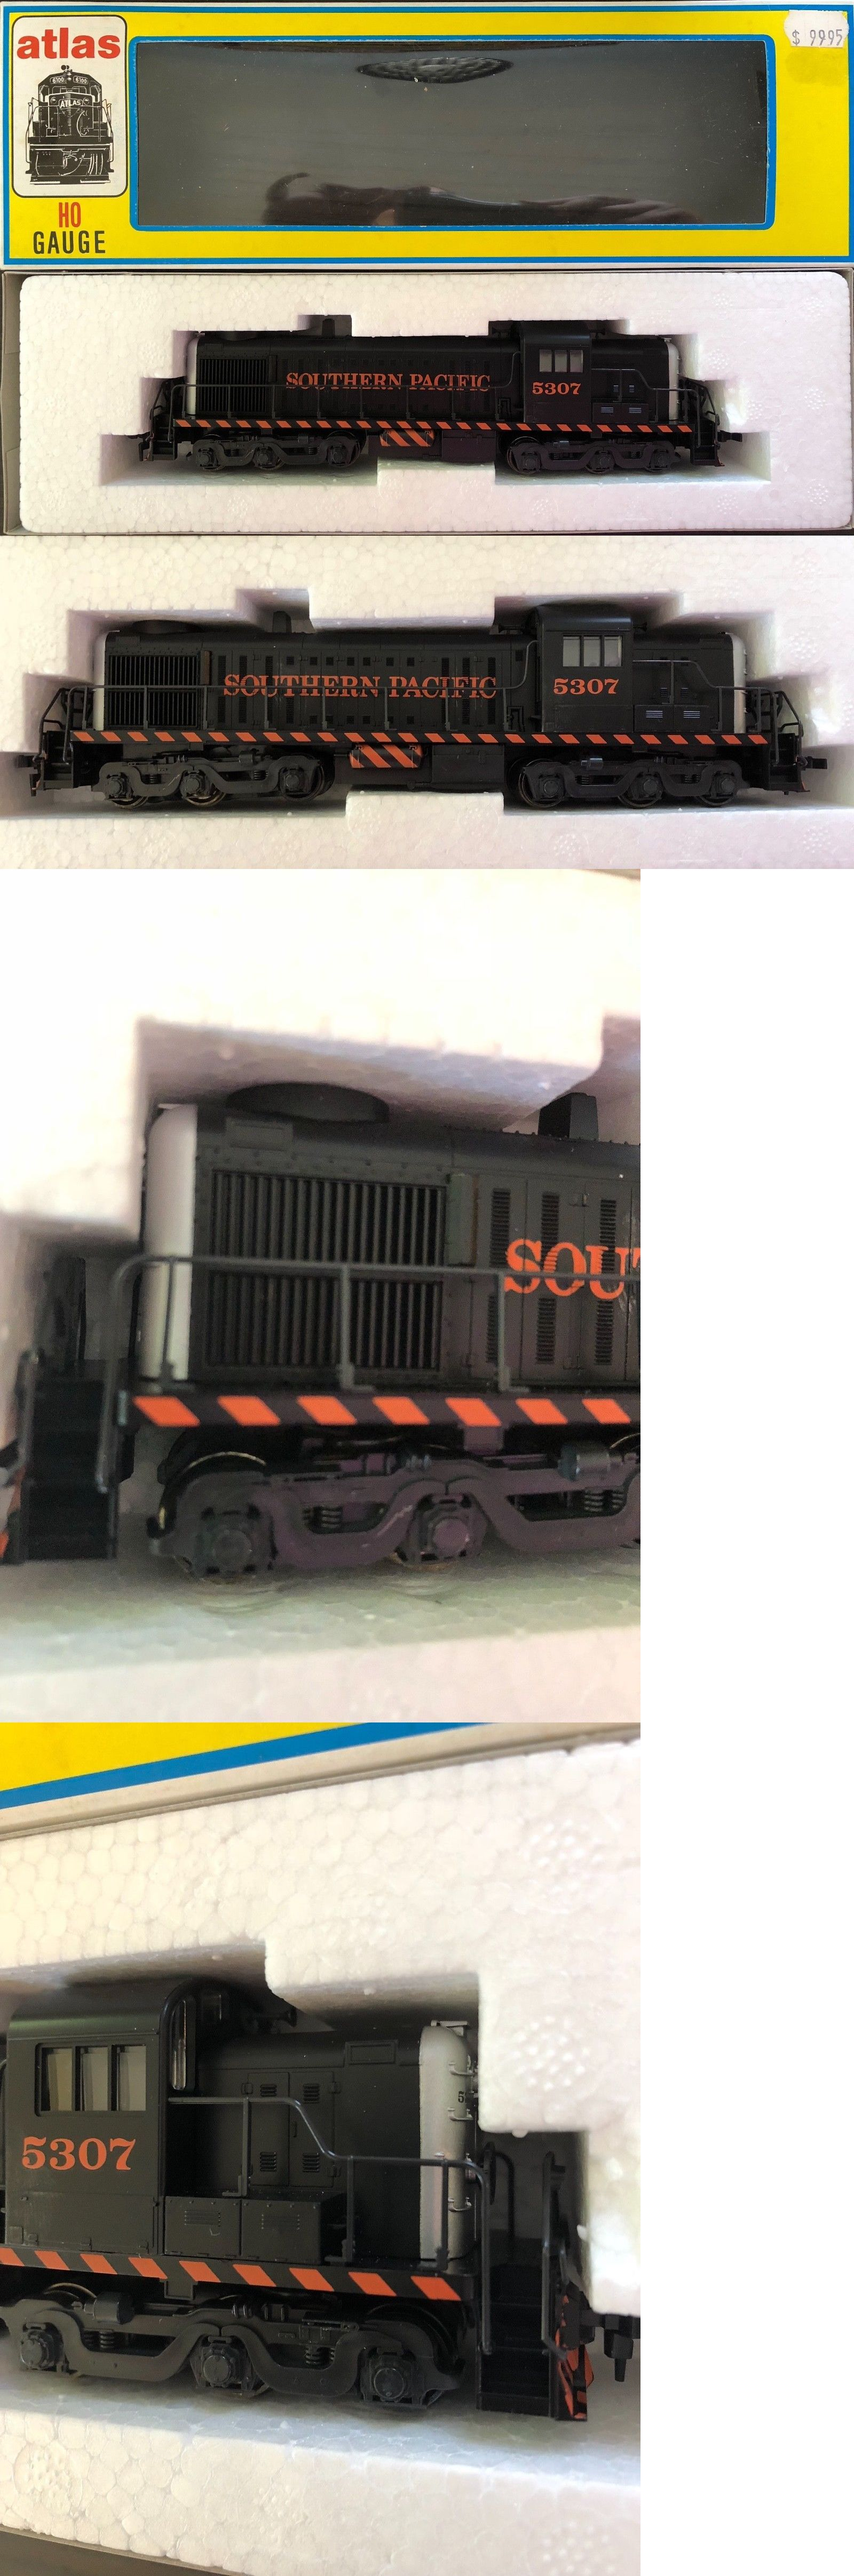 LGB 10090 Adjustable Track 88-120 mm G Scale Garden Railway